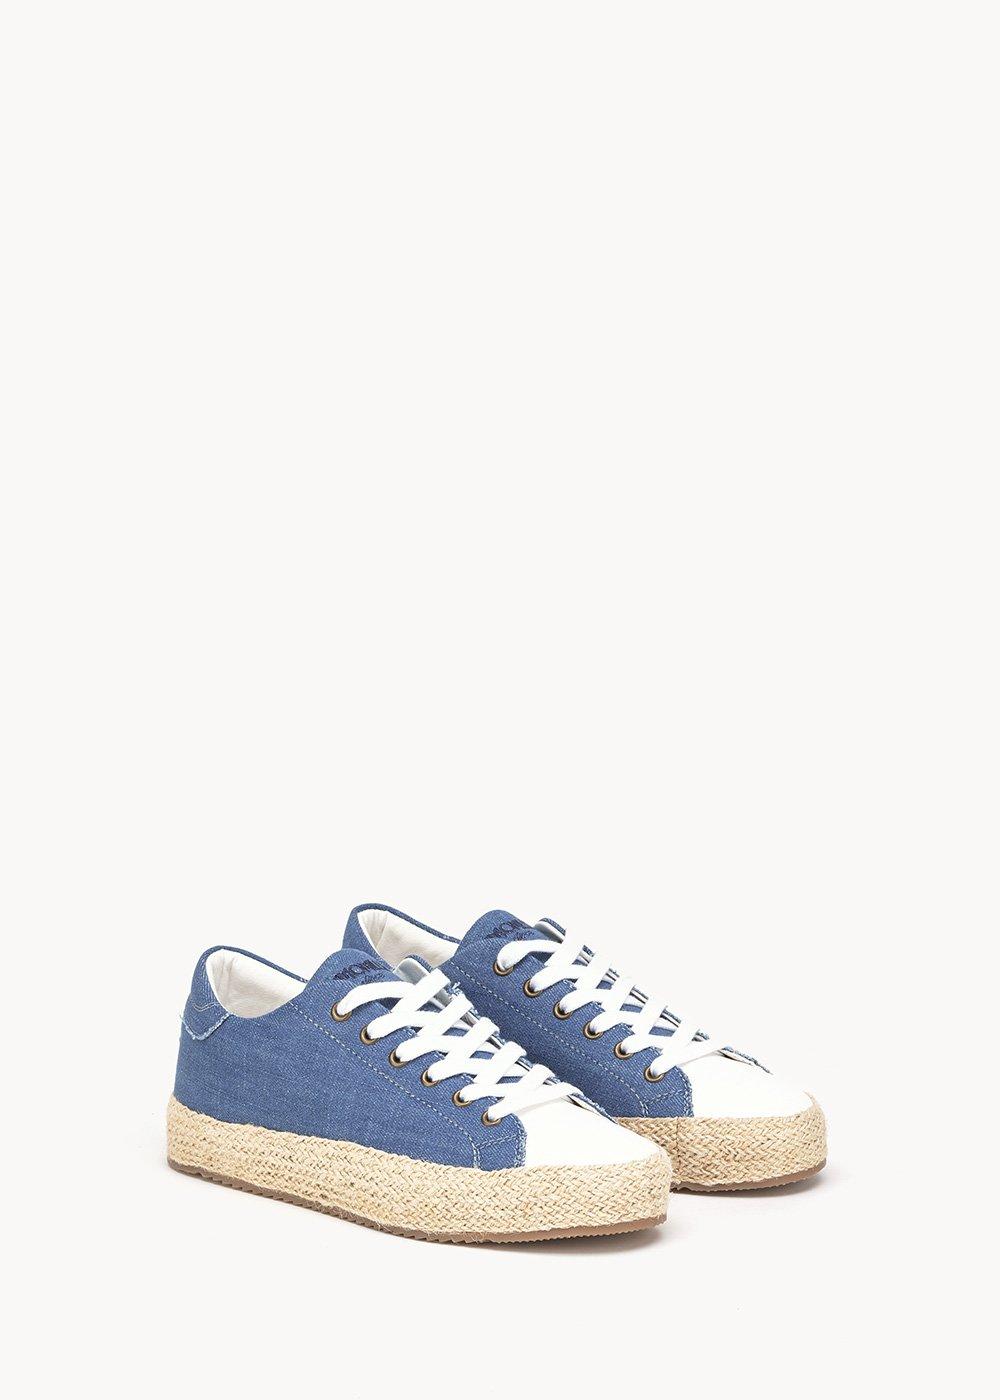 Shelly canvas shoe - Medium Blue - Woman